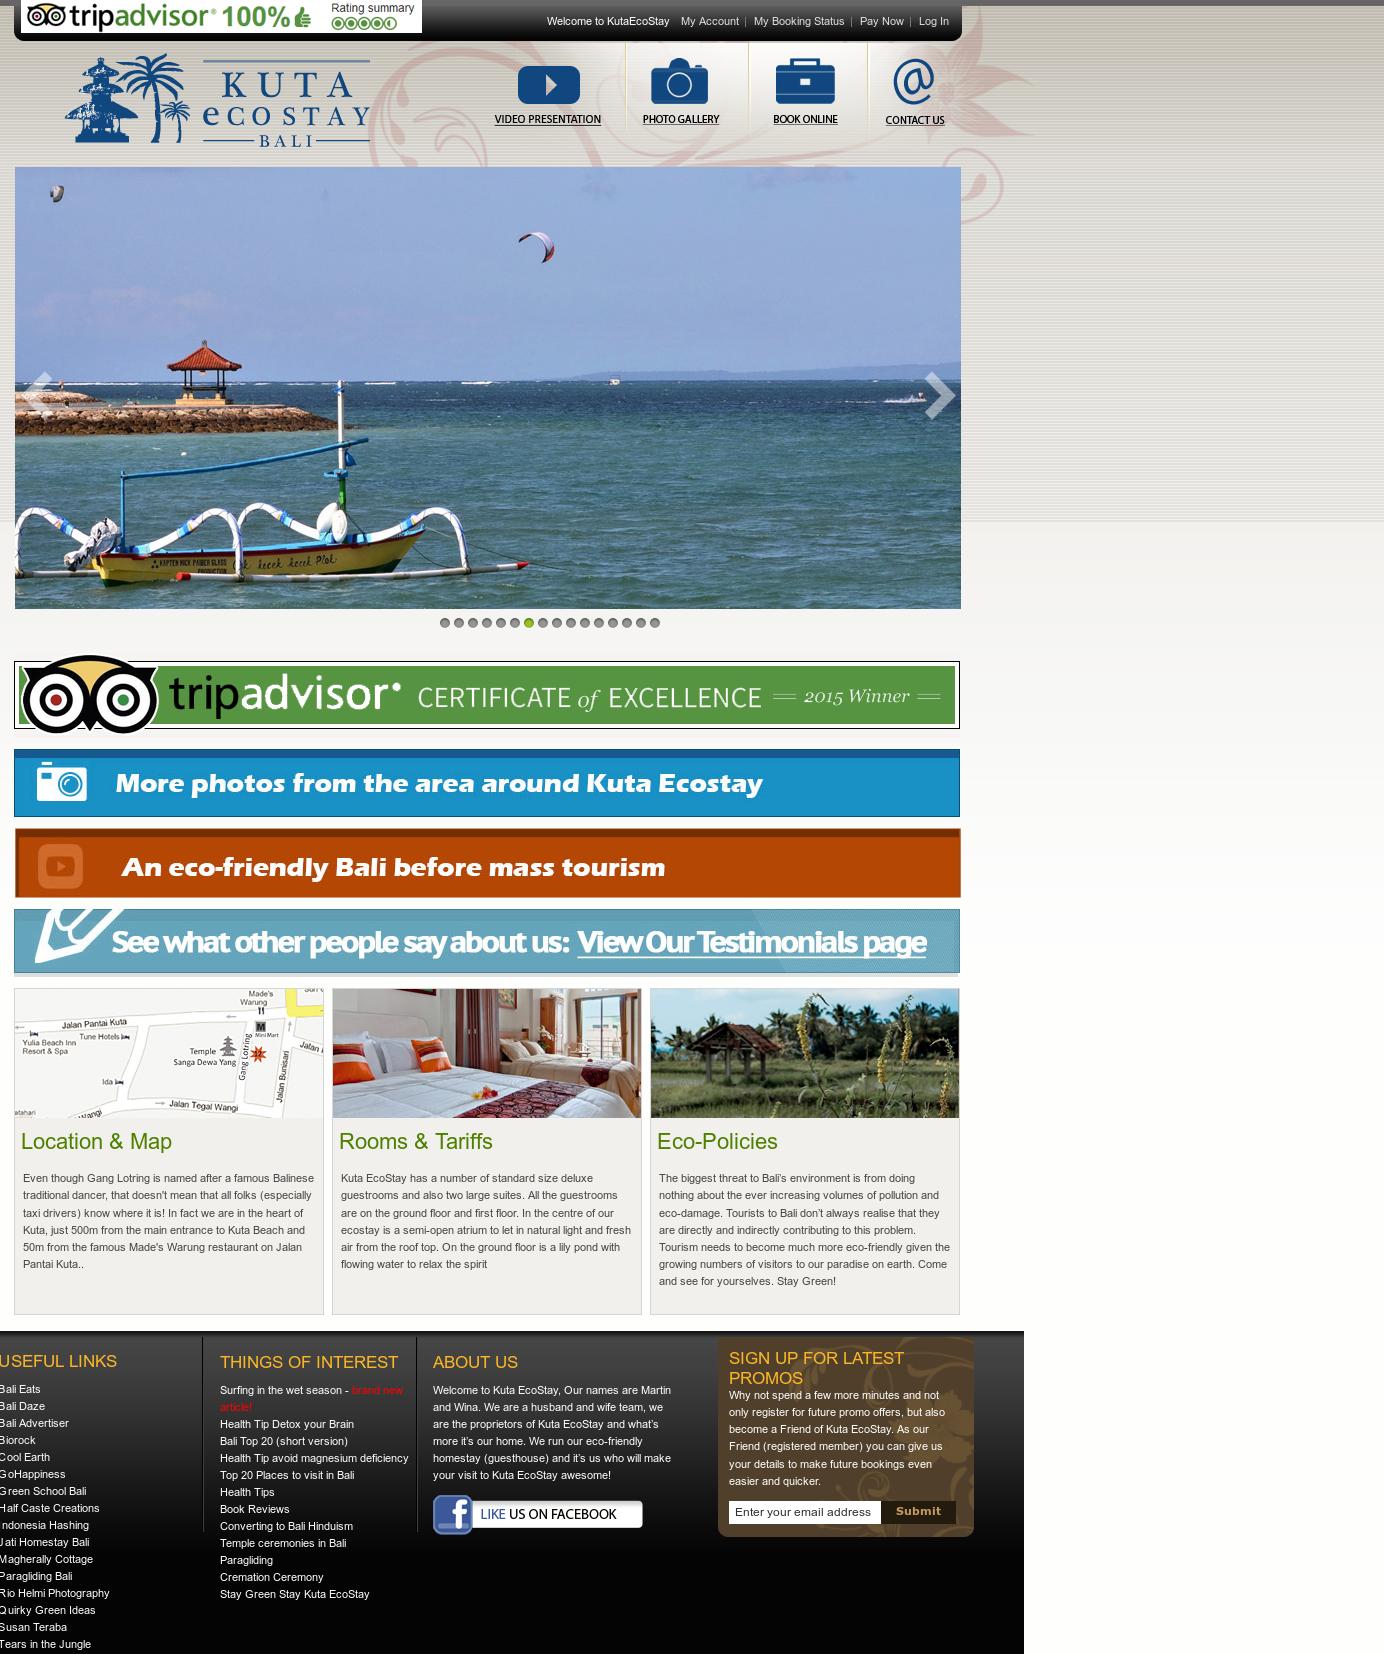 Kuta Ecostay Competitors, Revenue and Employees - Owler Company Profile